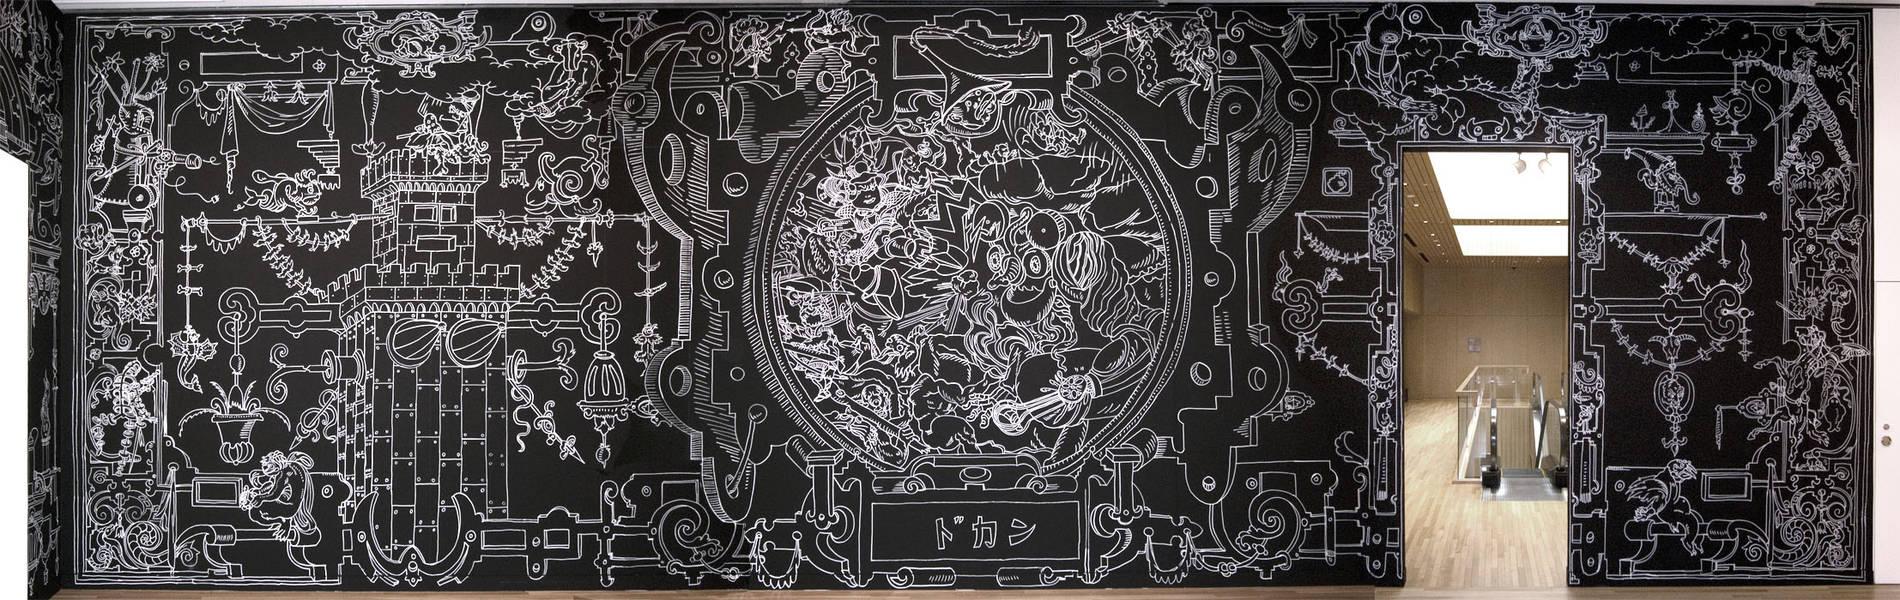 ·: Nicolas Buffe :· - Nicolas Buffe - 2008---04 - 屋上庭園 : Roof Gardens - 11 iron age, wall drawing, marker ink, 13x4m